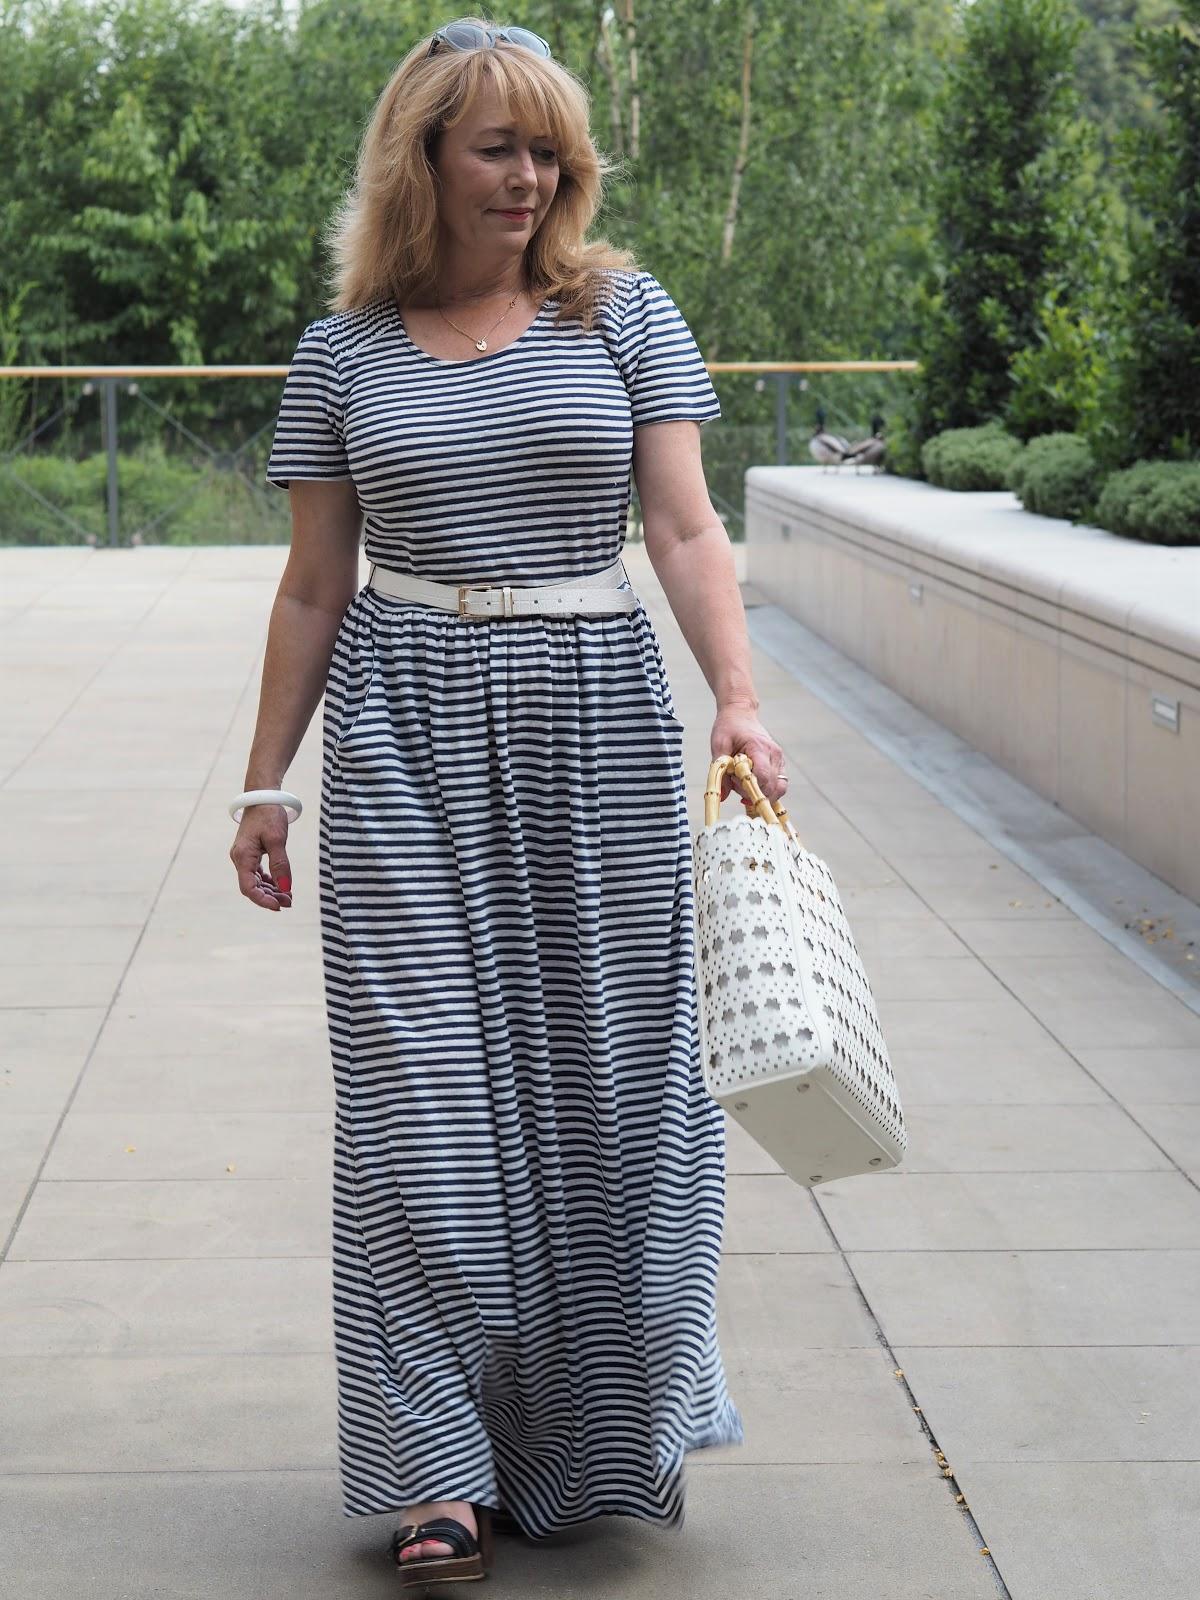 Laura Ashley Classic Stripe Dress Amp White Cutwork Bag